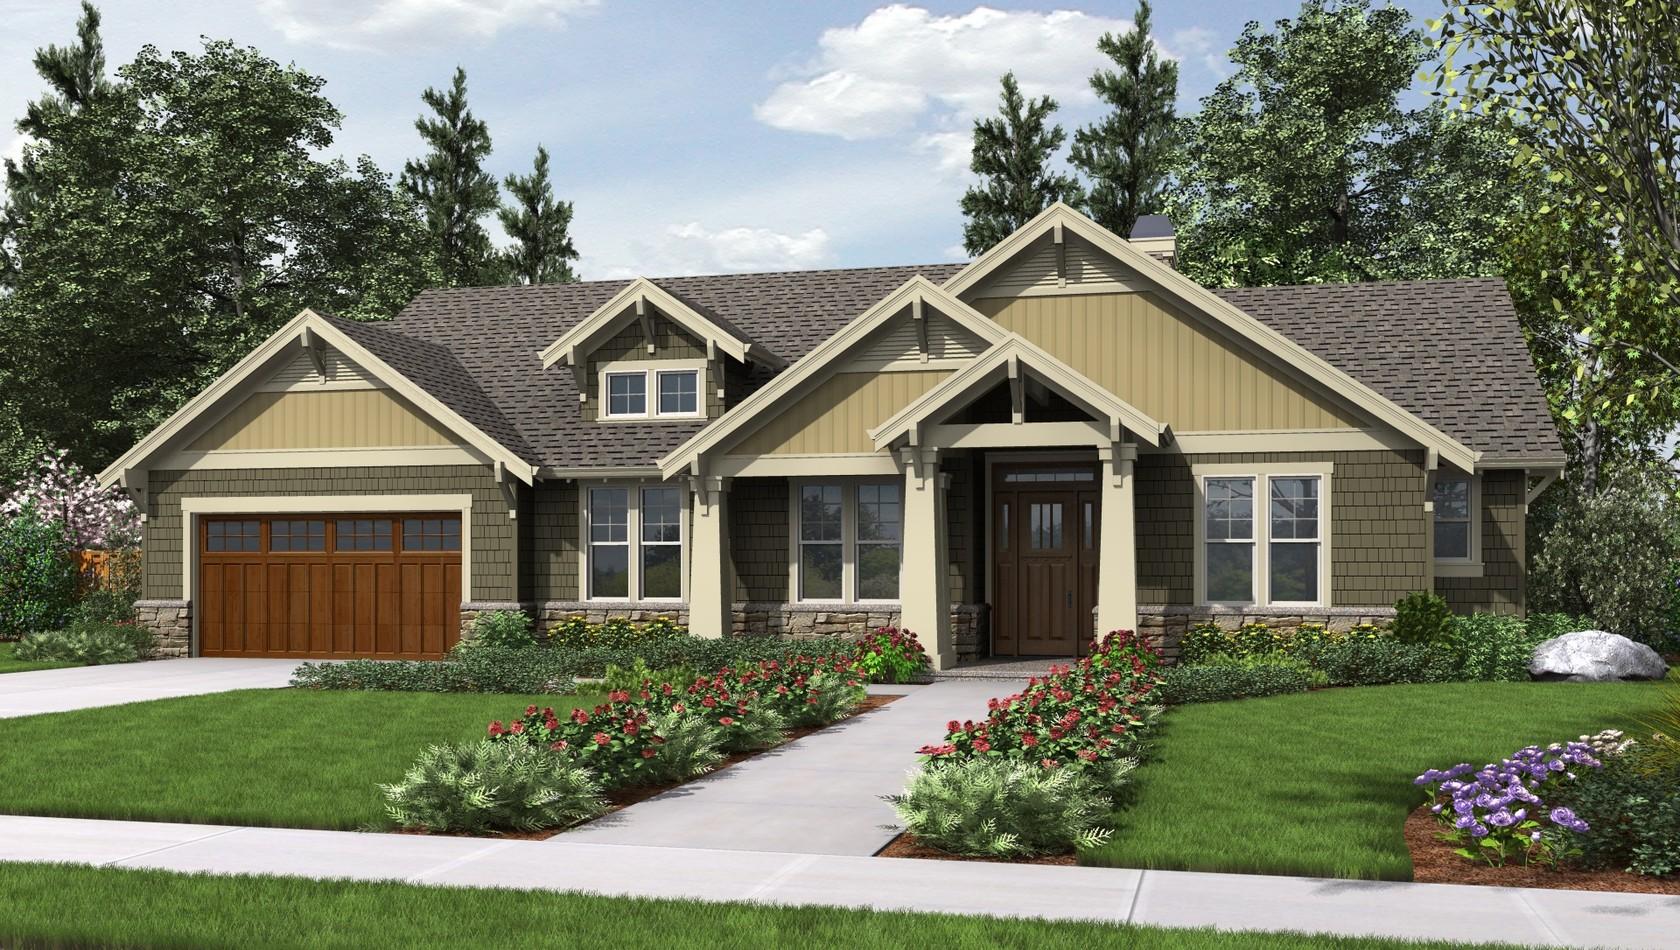 Mascord House Plan B1144EB: The